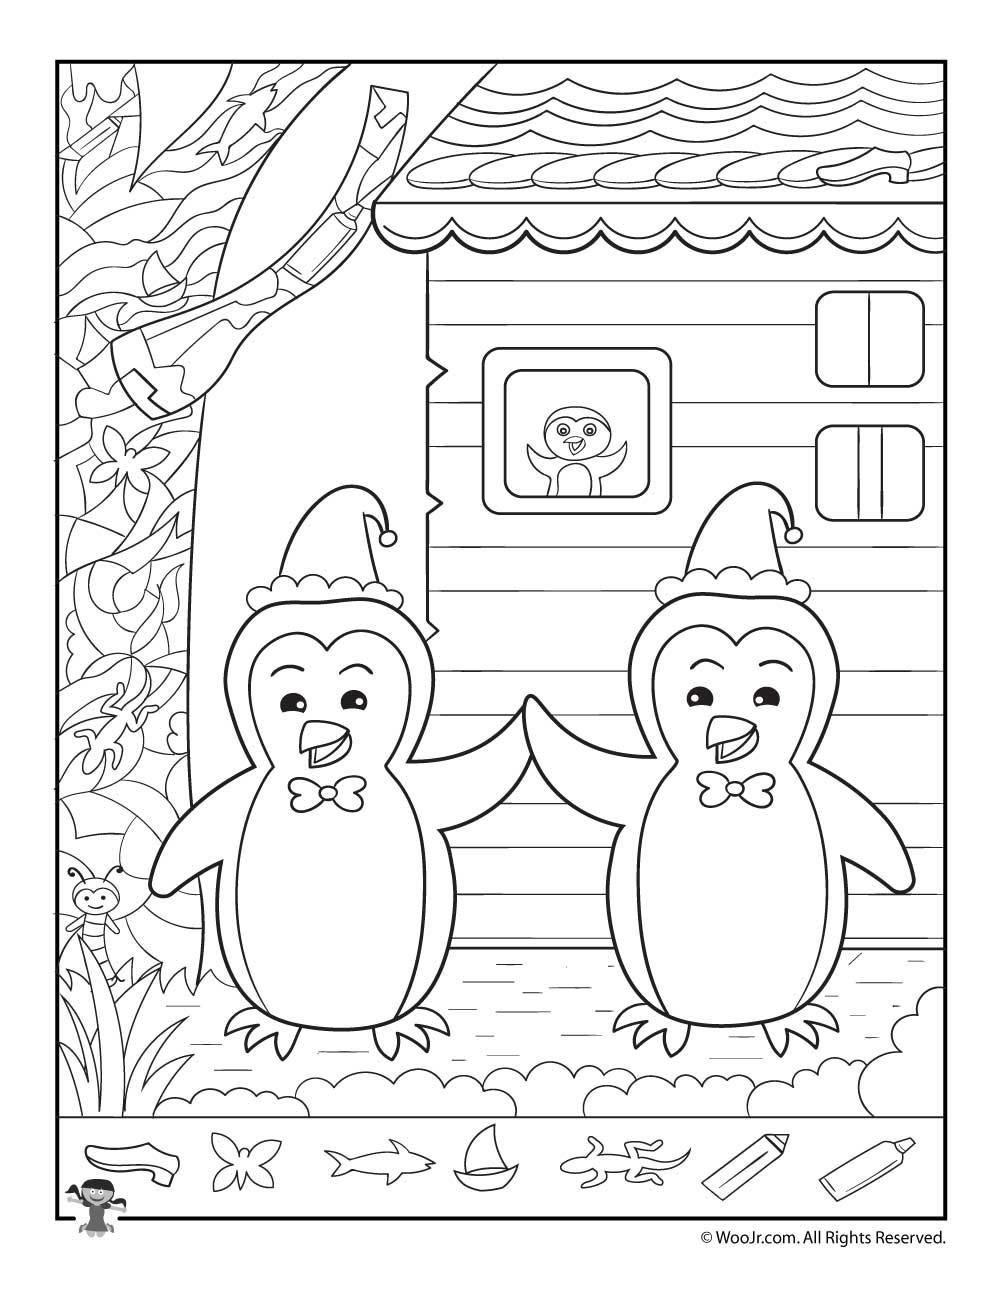 Christmas Hidden Pictures Printable Christmas Hidden Printables for Kids